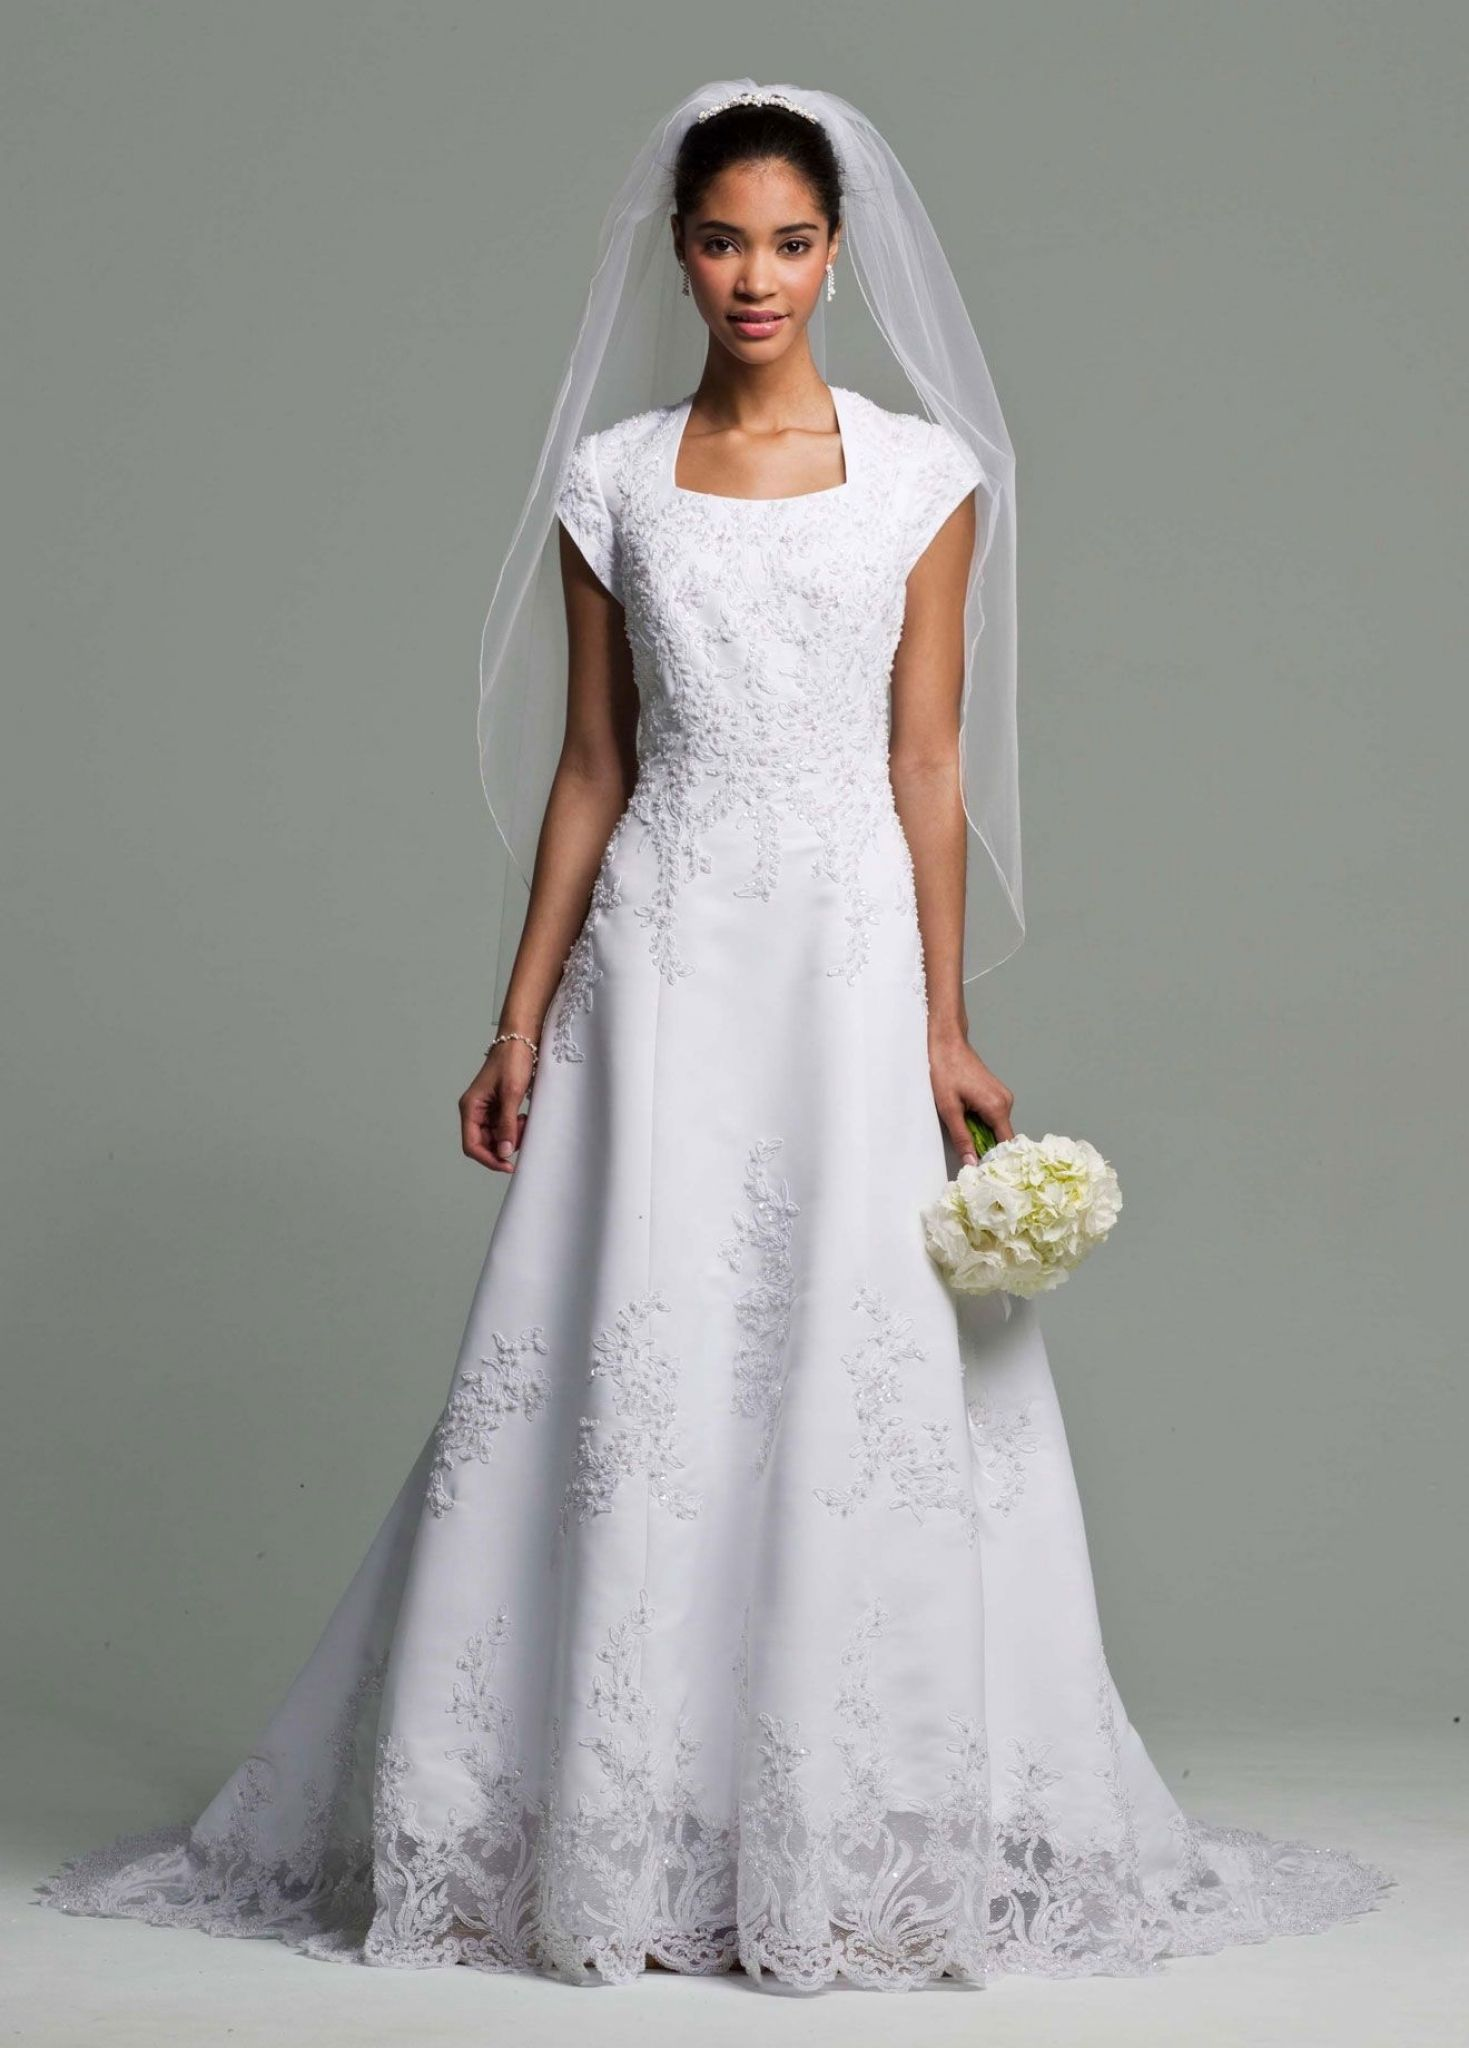 Lace gray bridesmaid dresses under 100